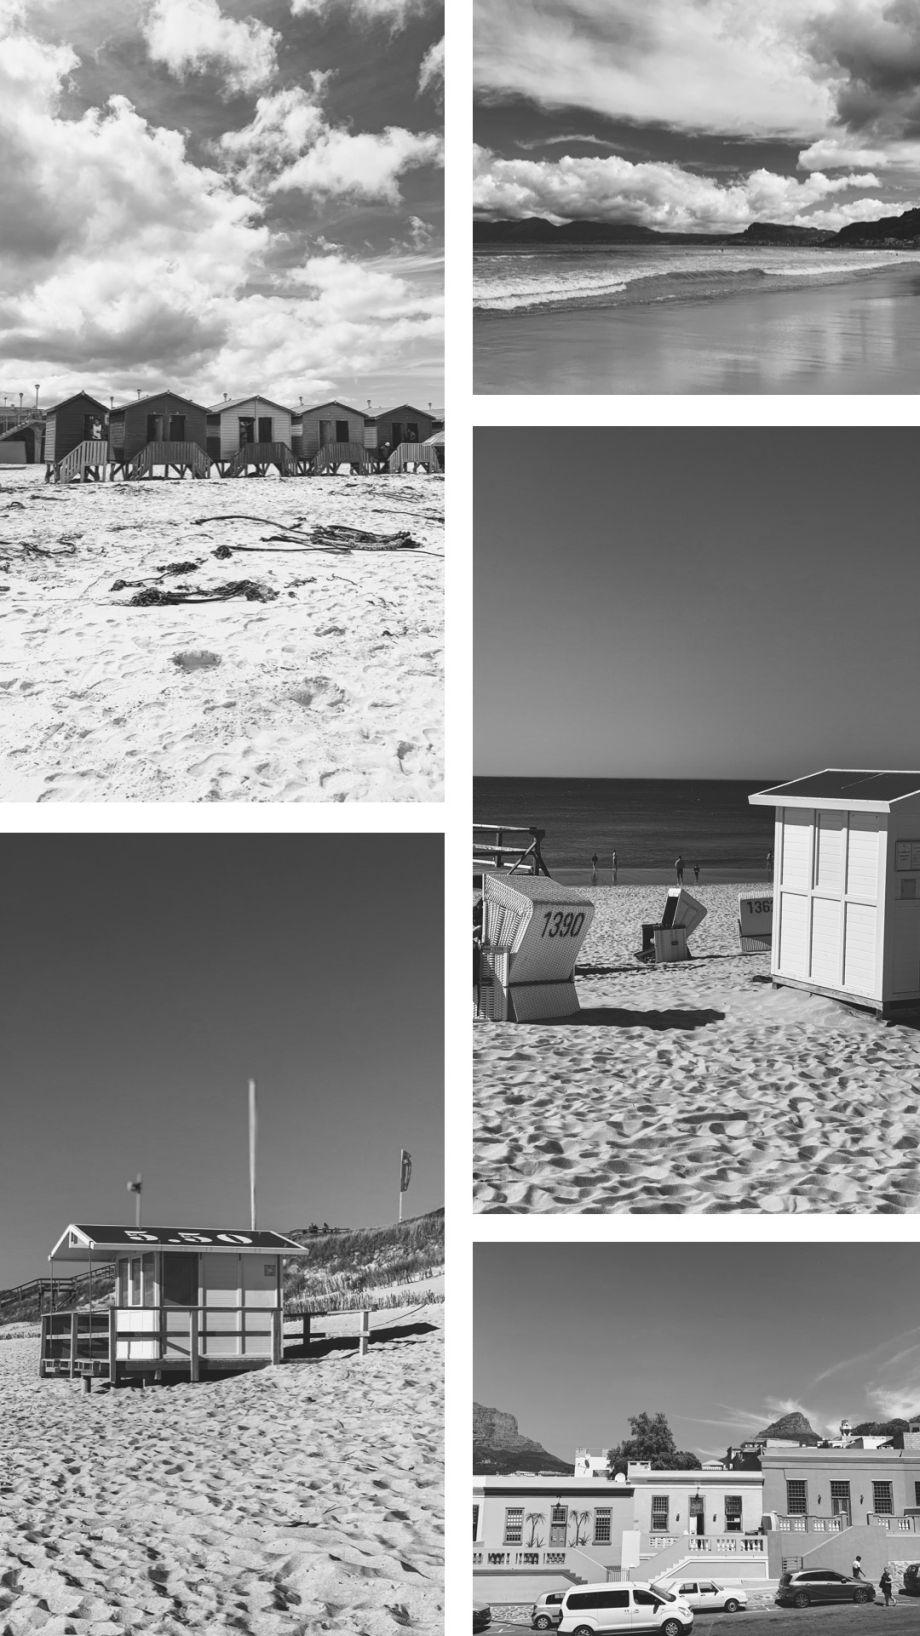 Smartphone Fotografie Workshop 11.01.2020 - buchbar